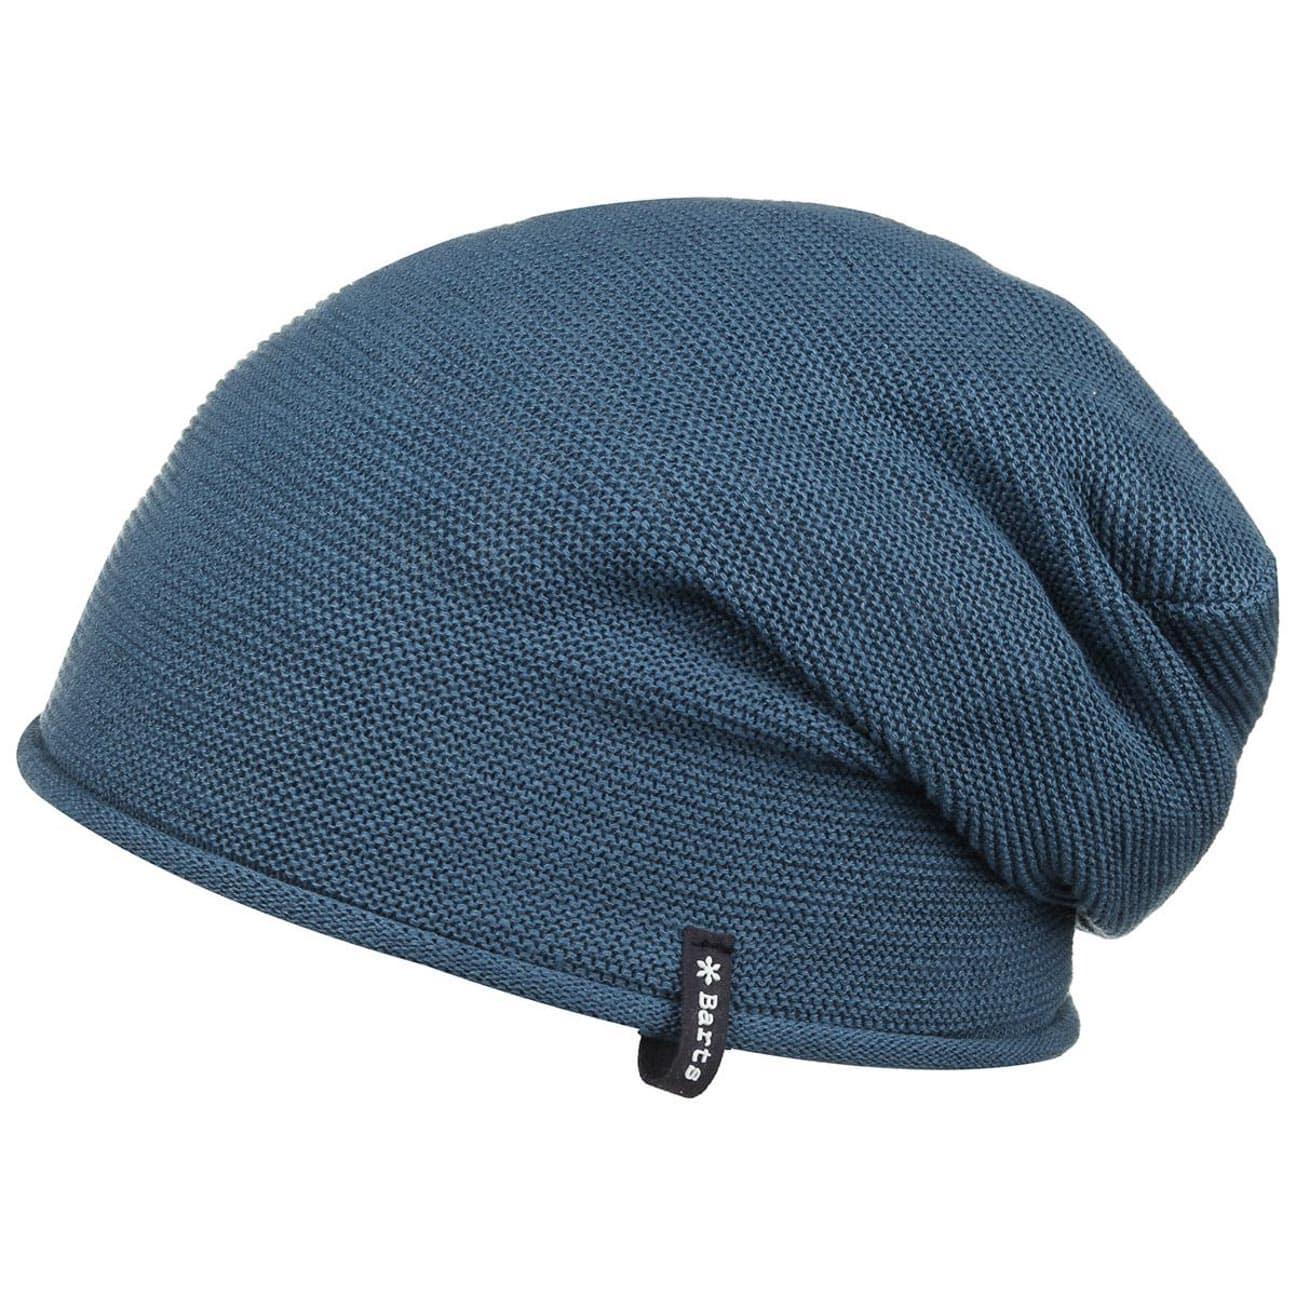 Caiman Beanie Hat Barts 1iYzBHz5